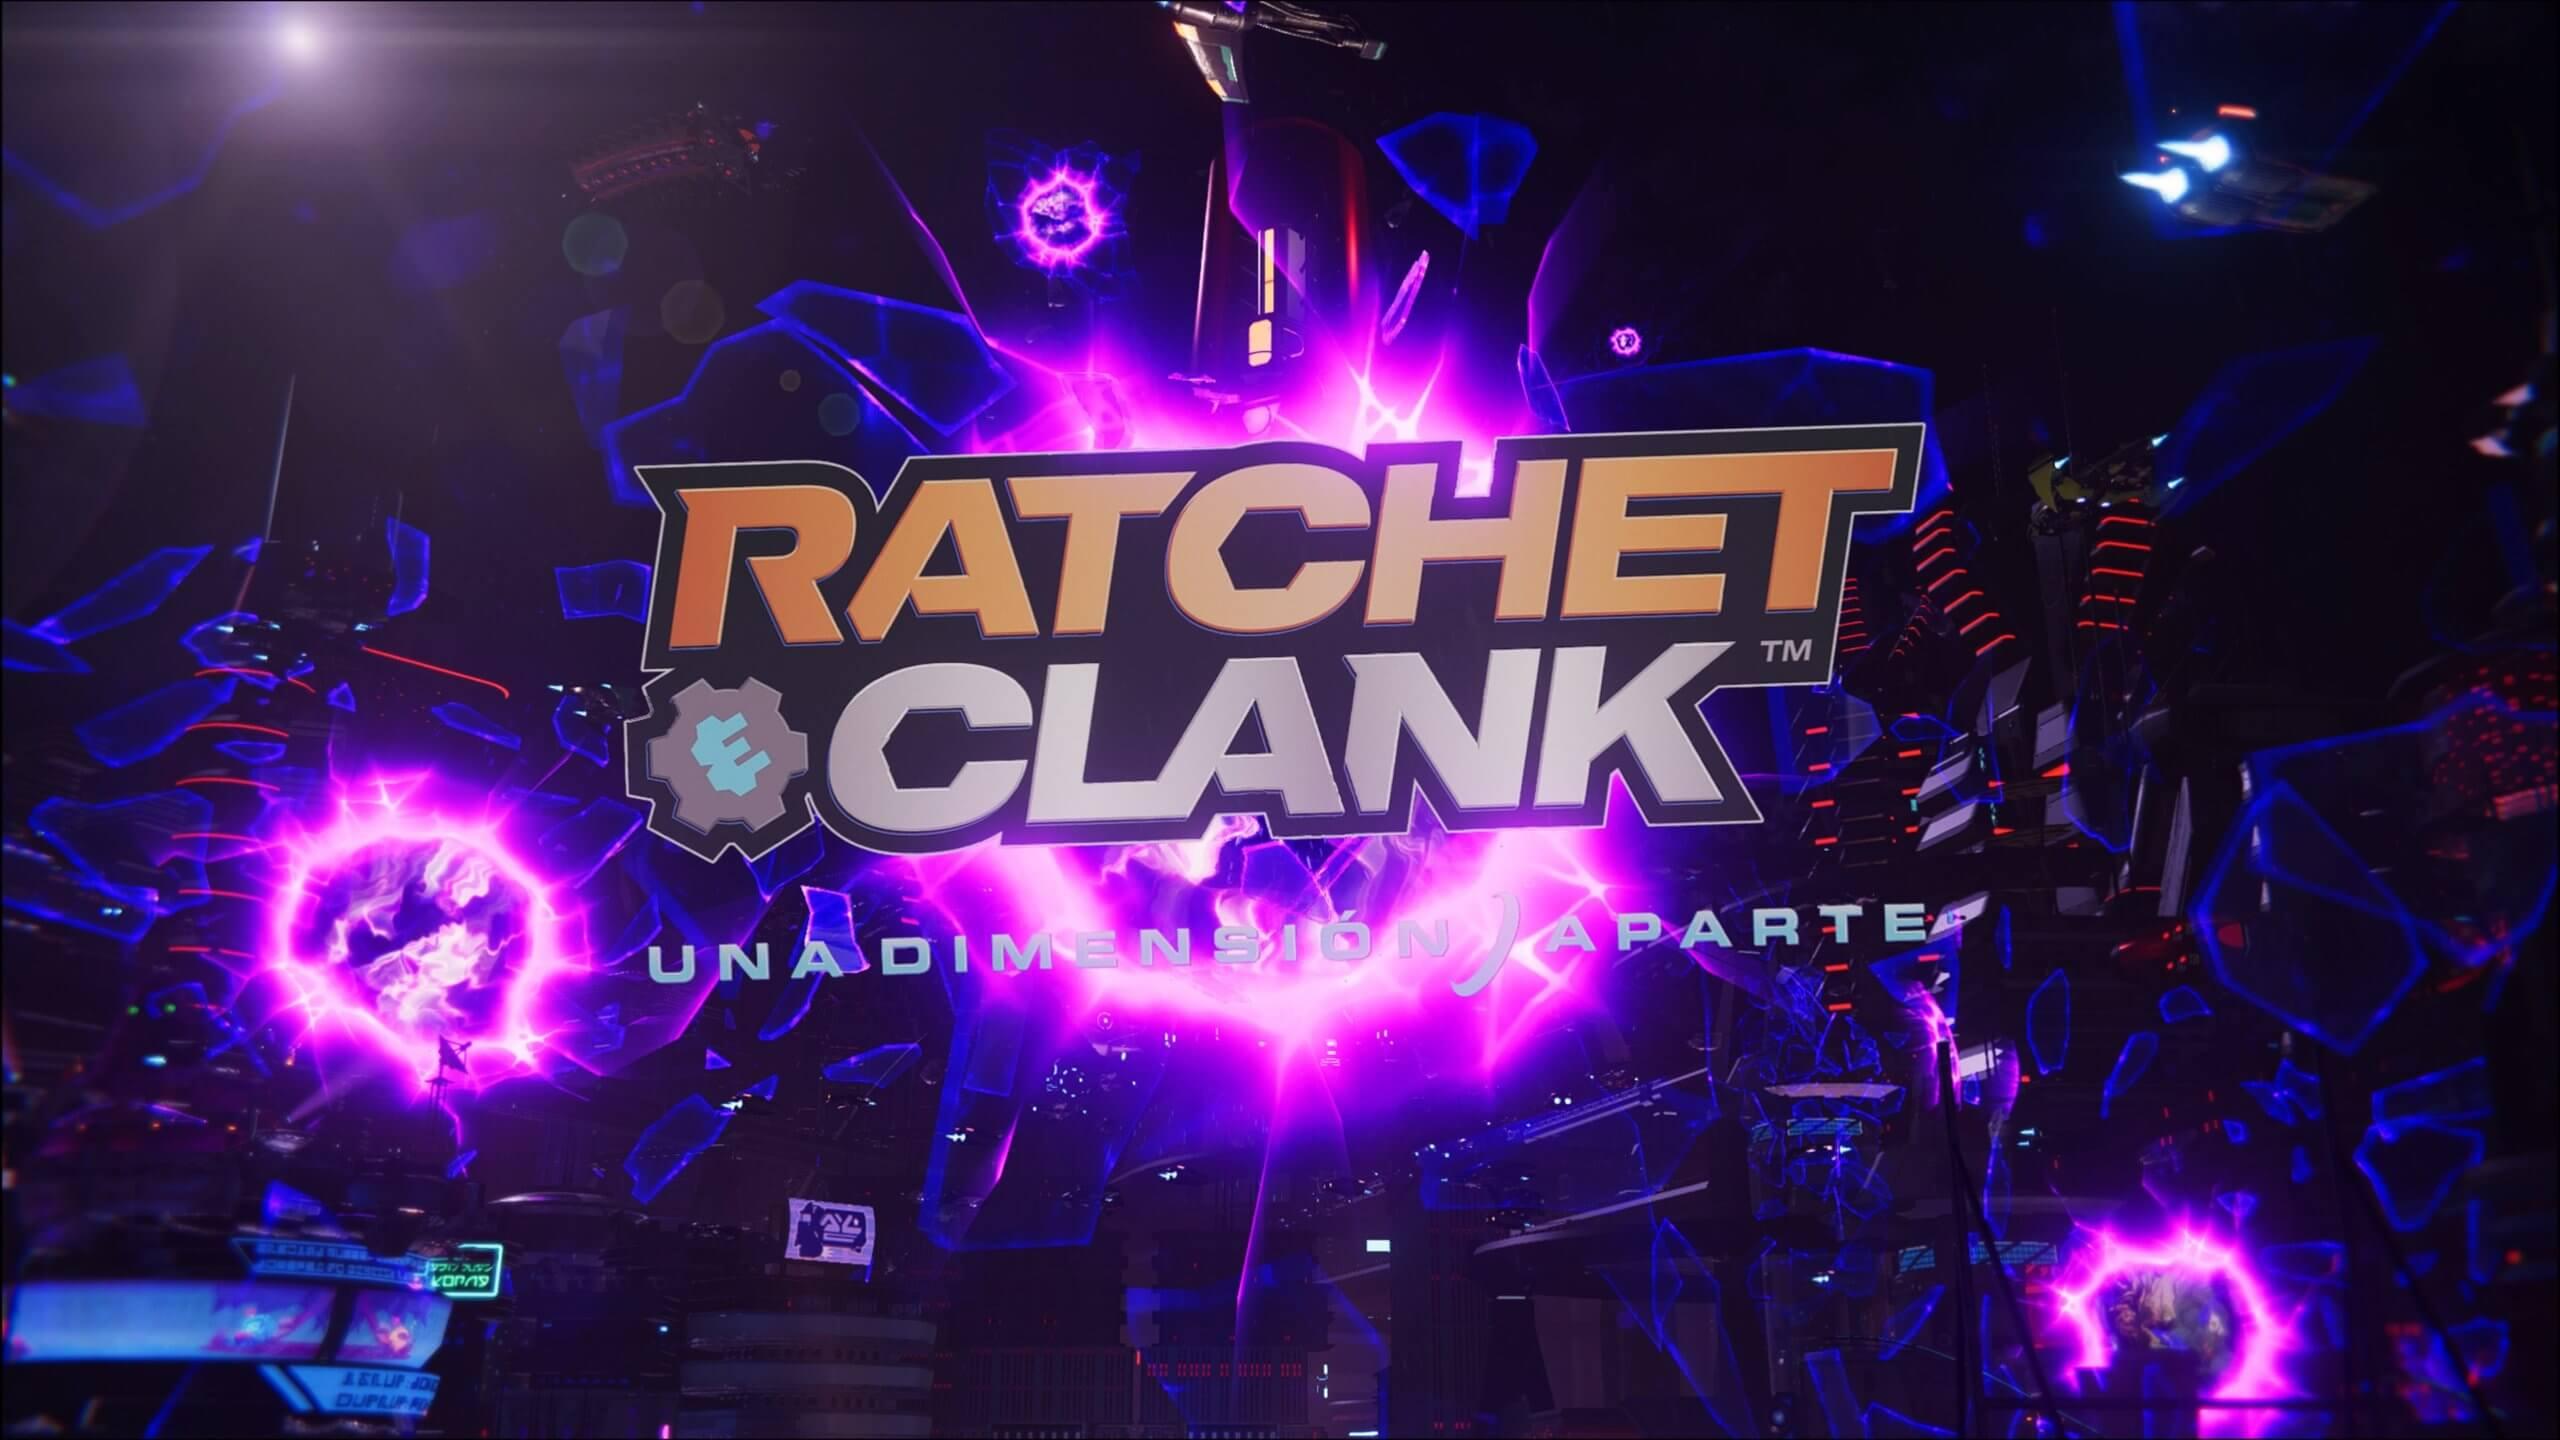 Ratchet and Clank Portada